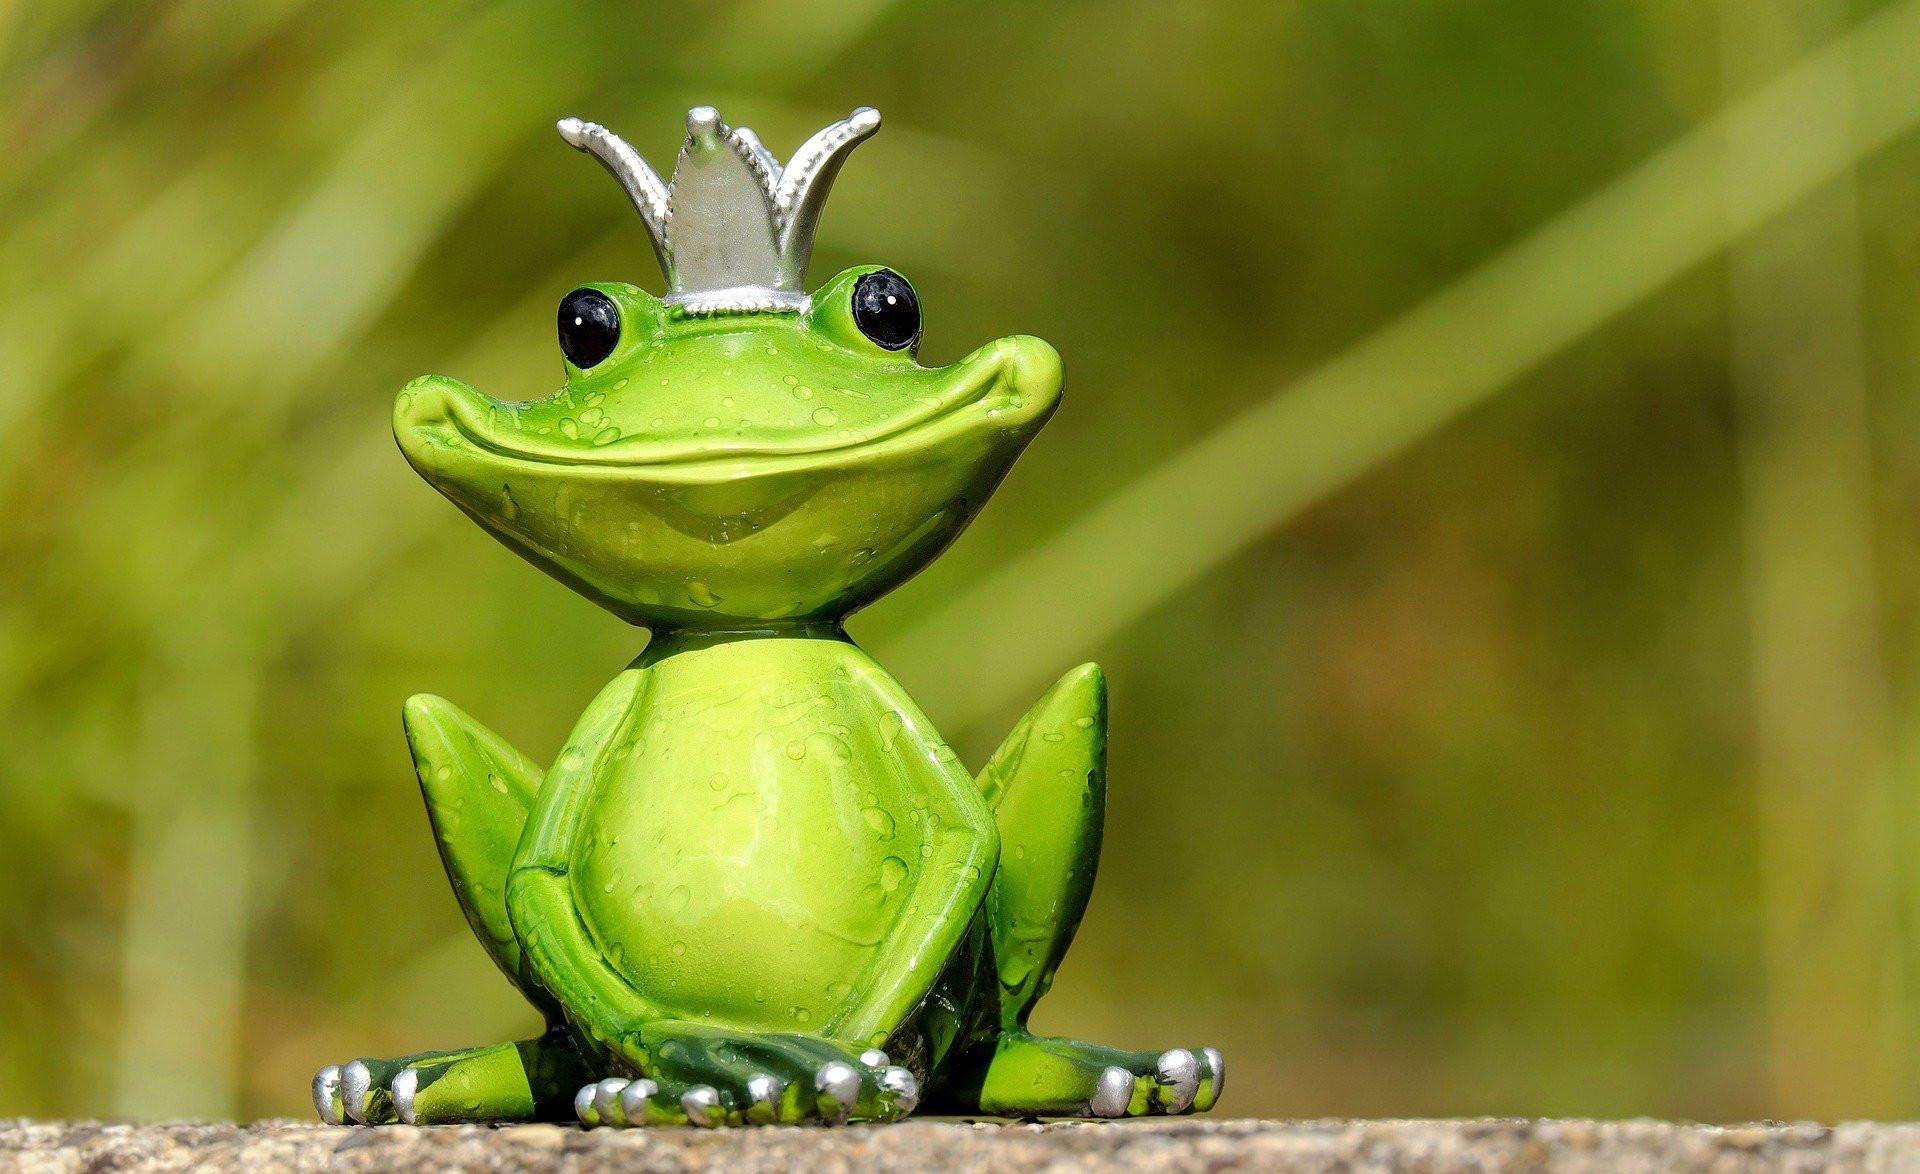 frog-2240764_1920